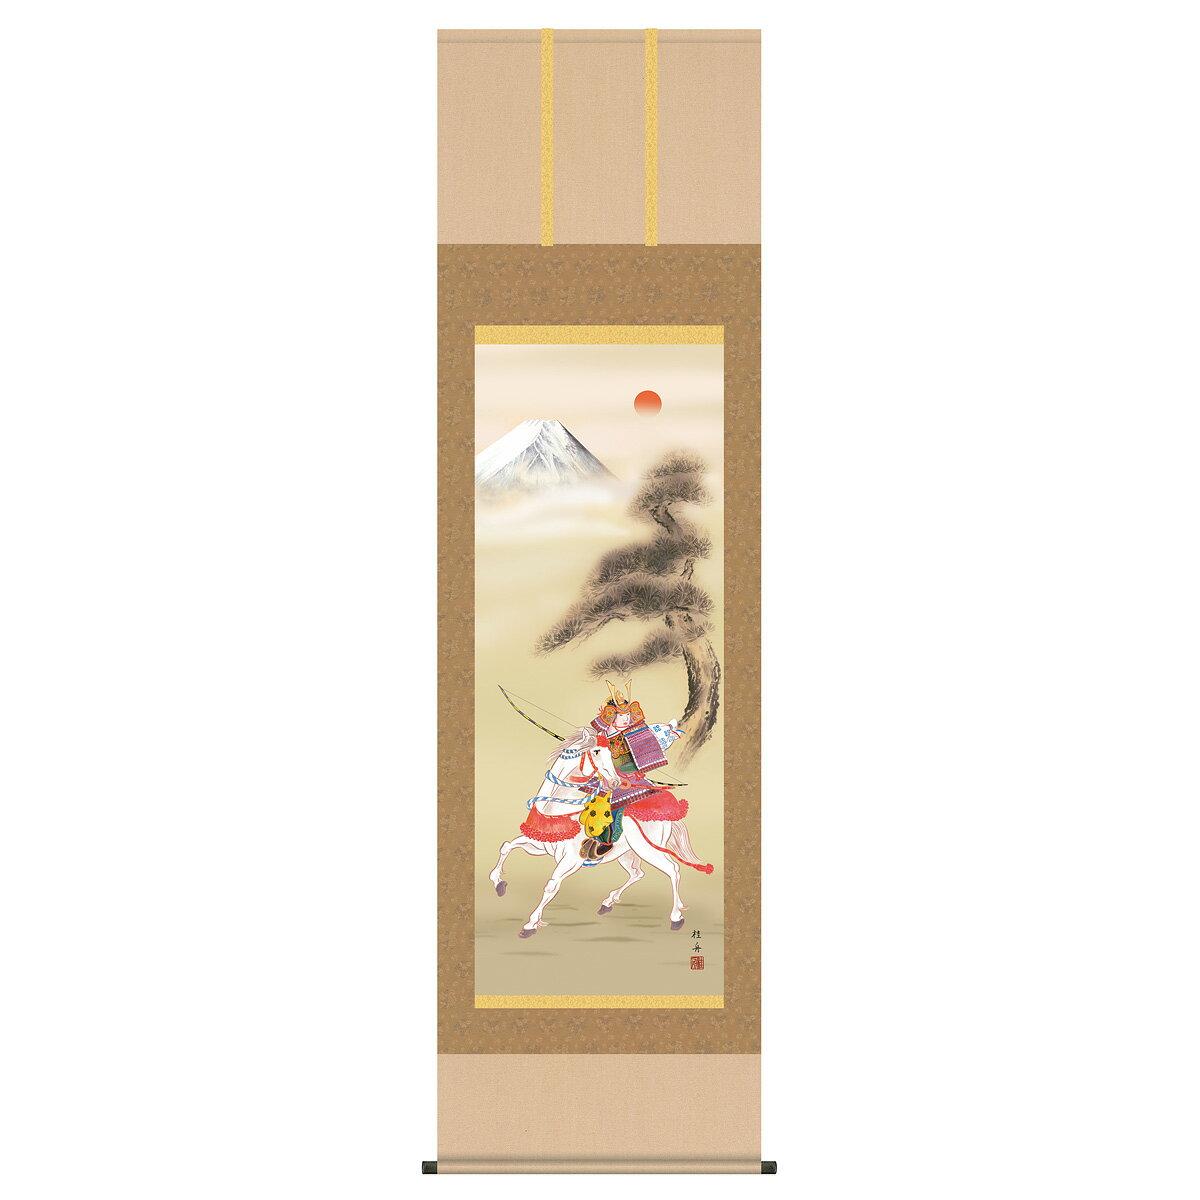 端午の節句 正月 掛け軸 掛軸 「長江桂舟(三美会)作 吉祥武者」 ●正月飾り 端午の節句